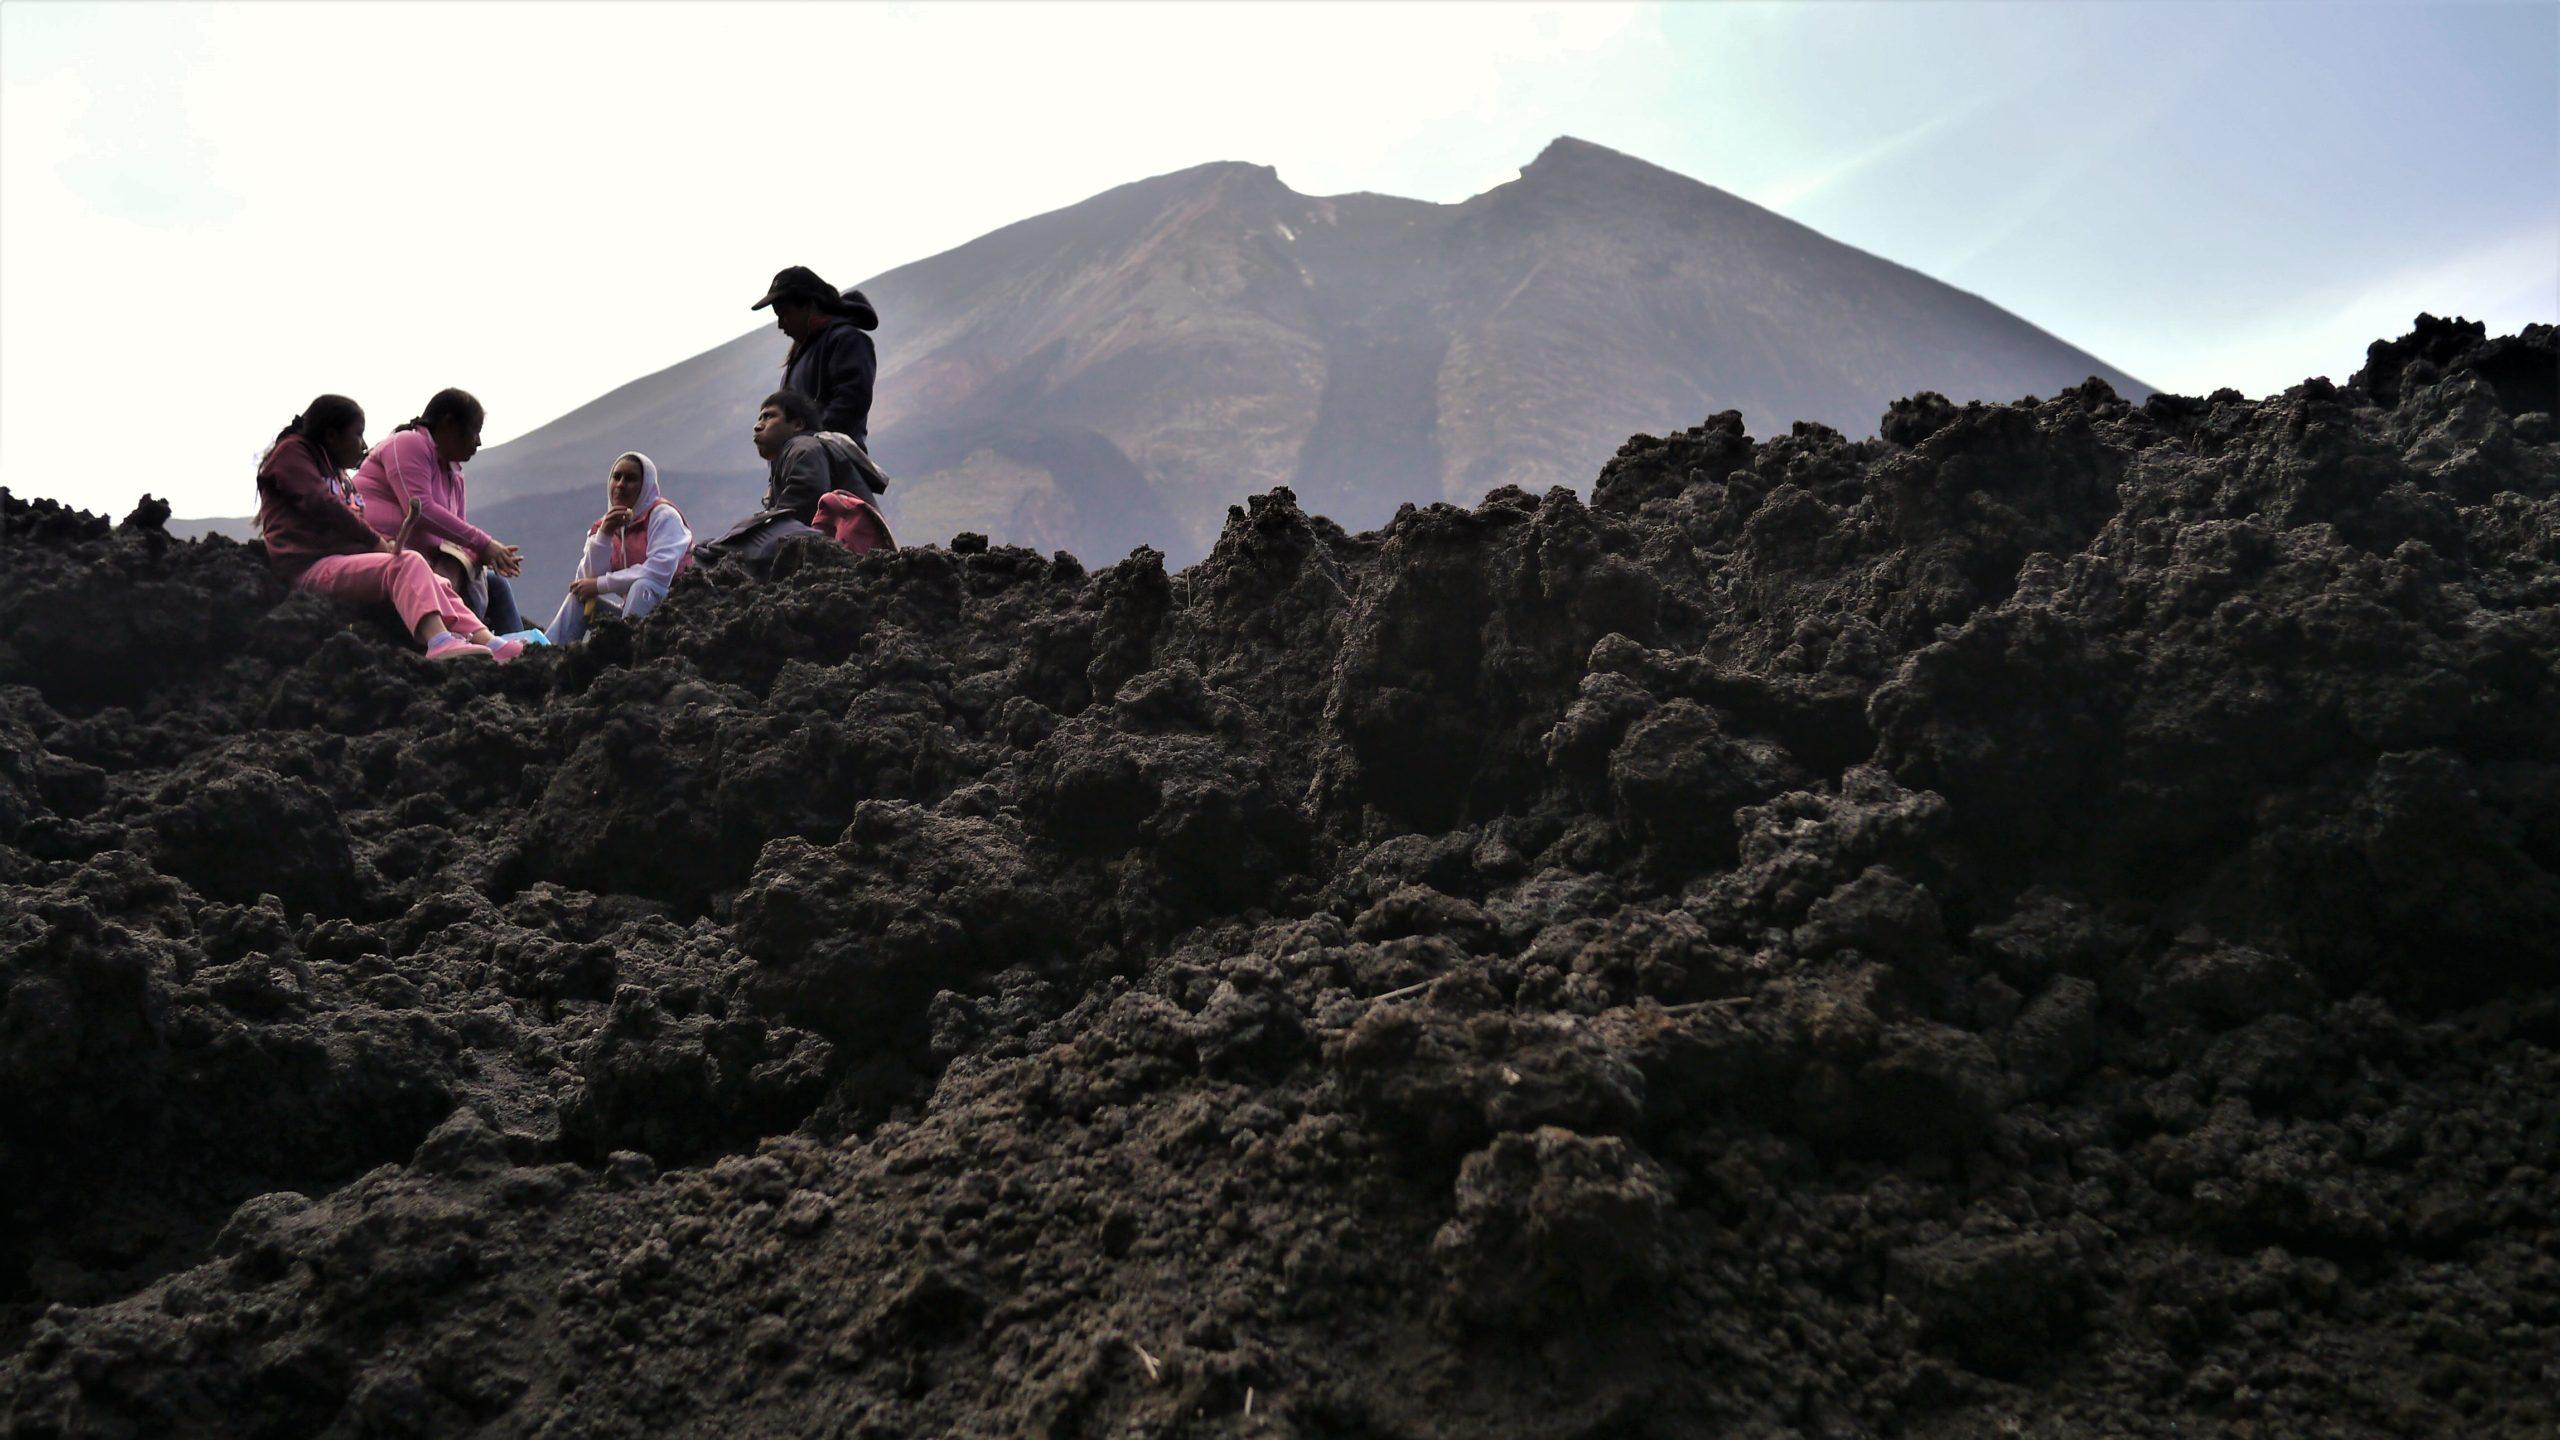 Guatemala faire ascension volcan Pacaya quelle agence choisir blog voyage